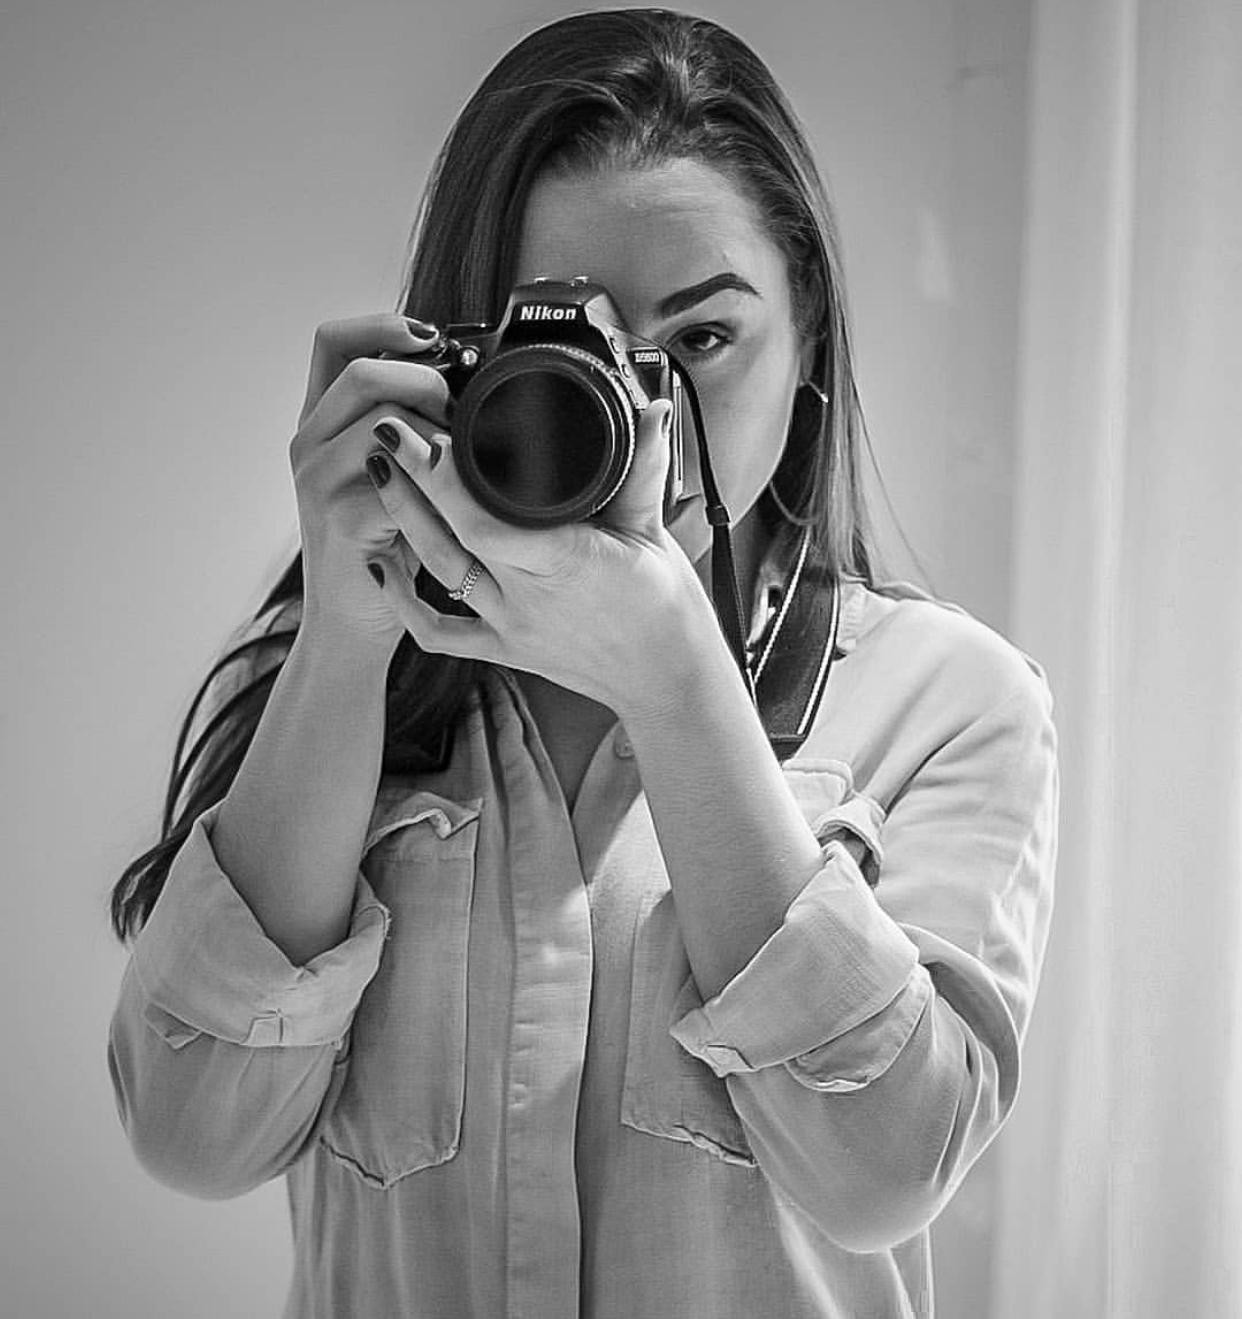 Samila Chinelatto